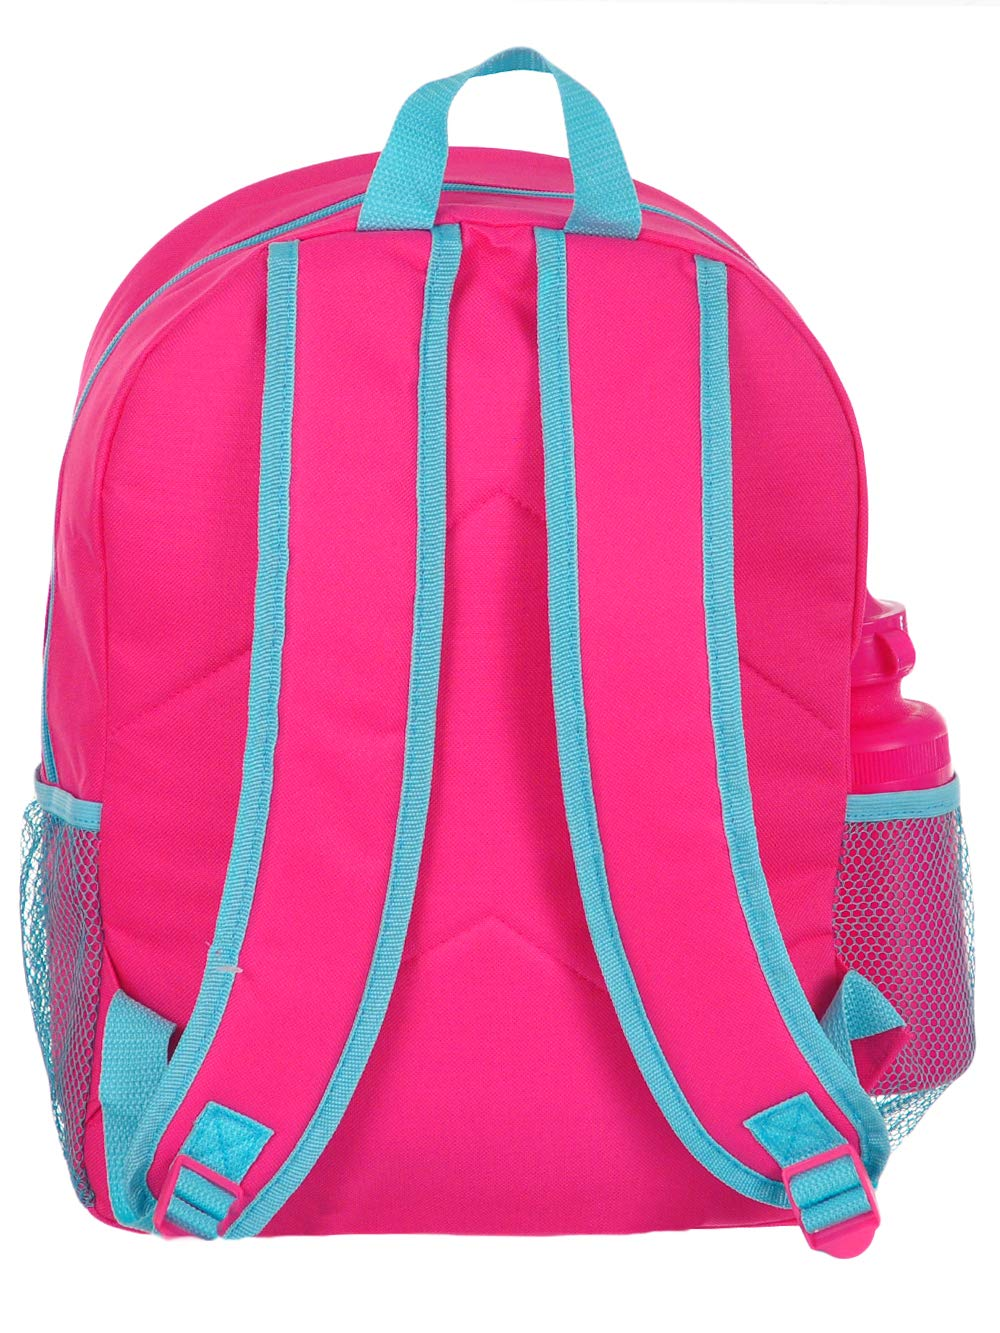 8179c991b8 Paw Patrol 5-Piece Backpack Set - Pink Multi